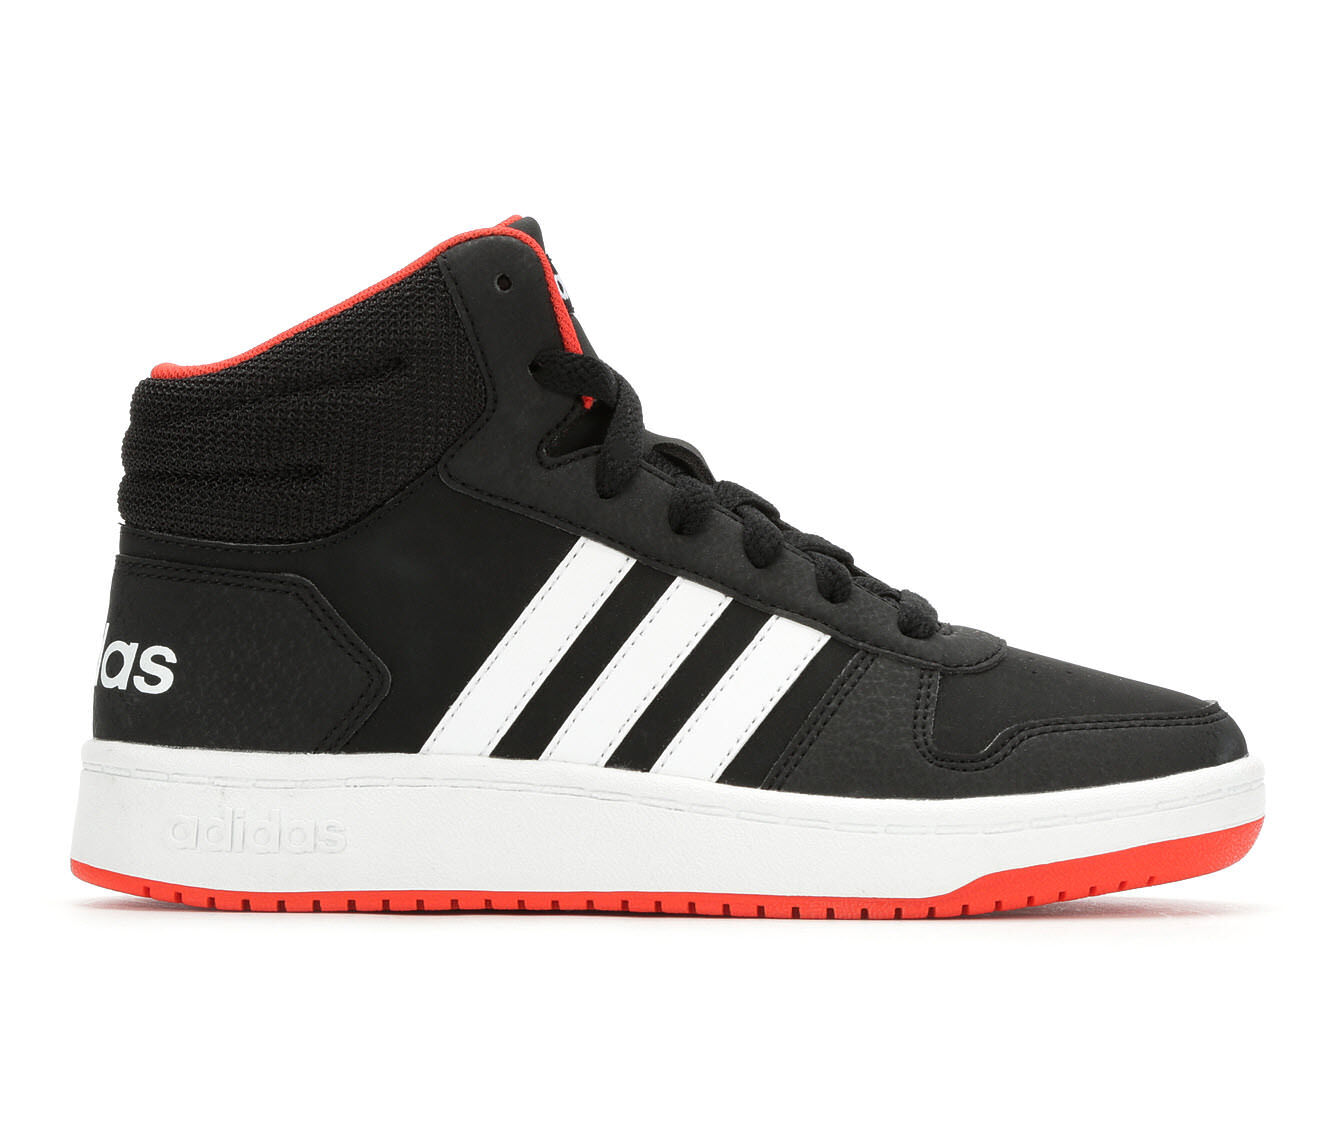 Big amp; Boys' Hoops Little Shoes 2 Kid Adidas Basketball Mid gqBBvSTR